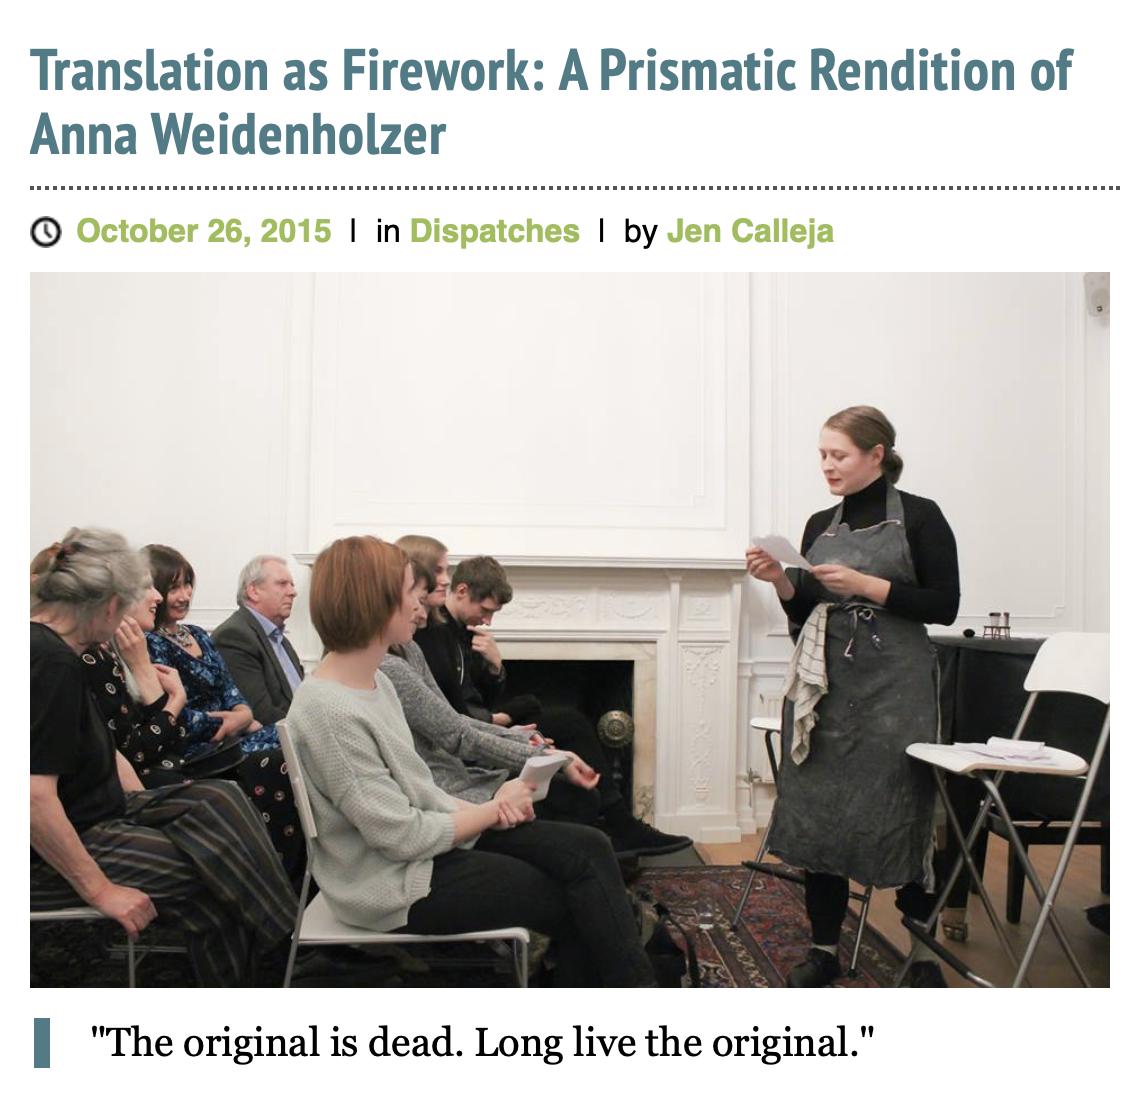 Translation as Firework by Jen Calleja